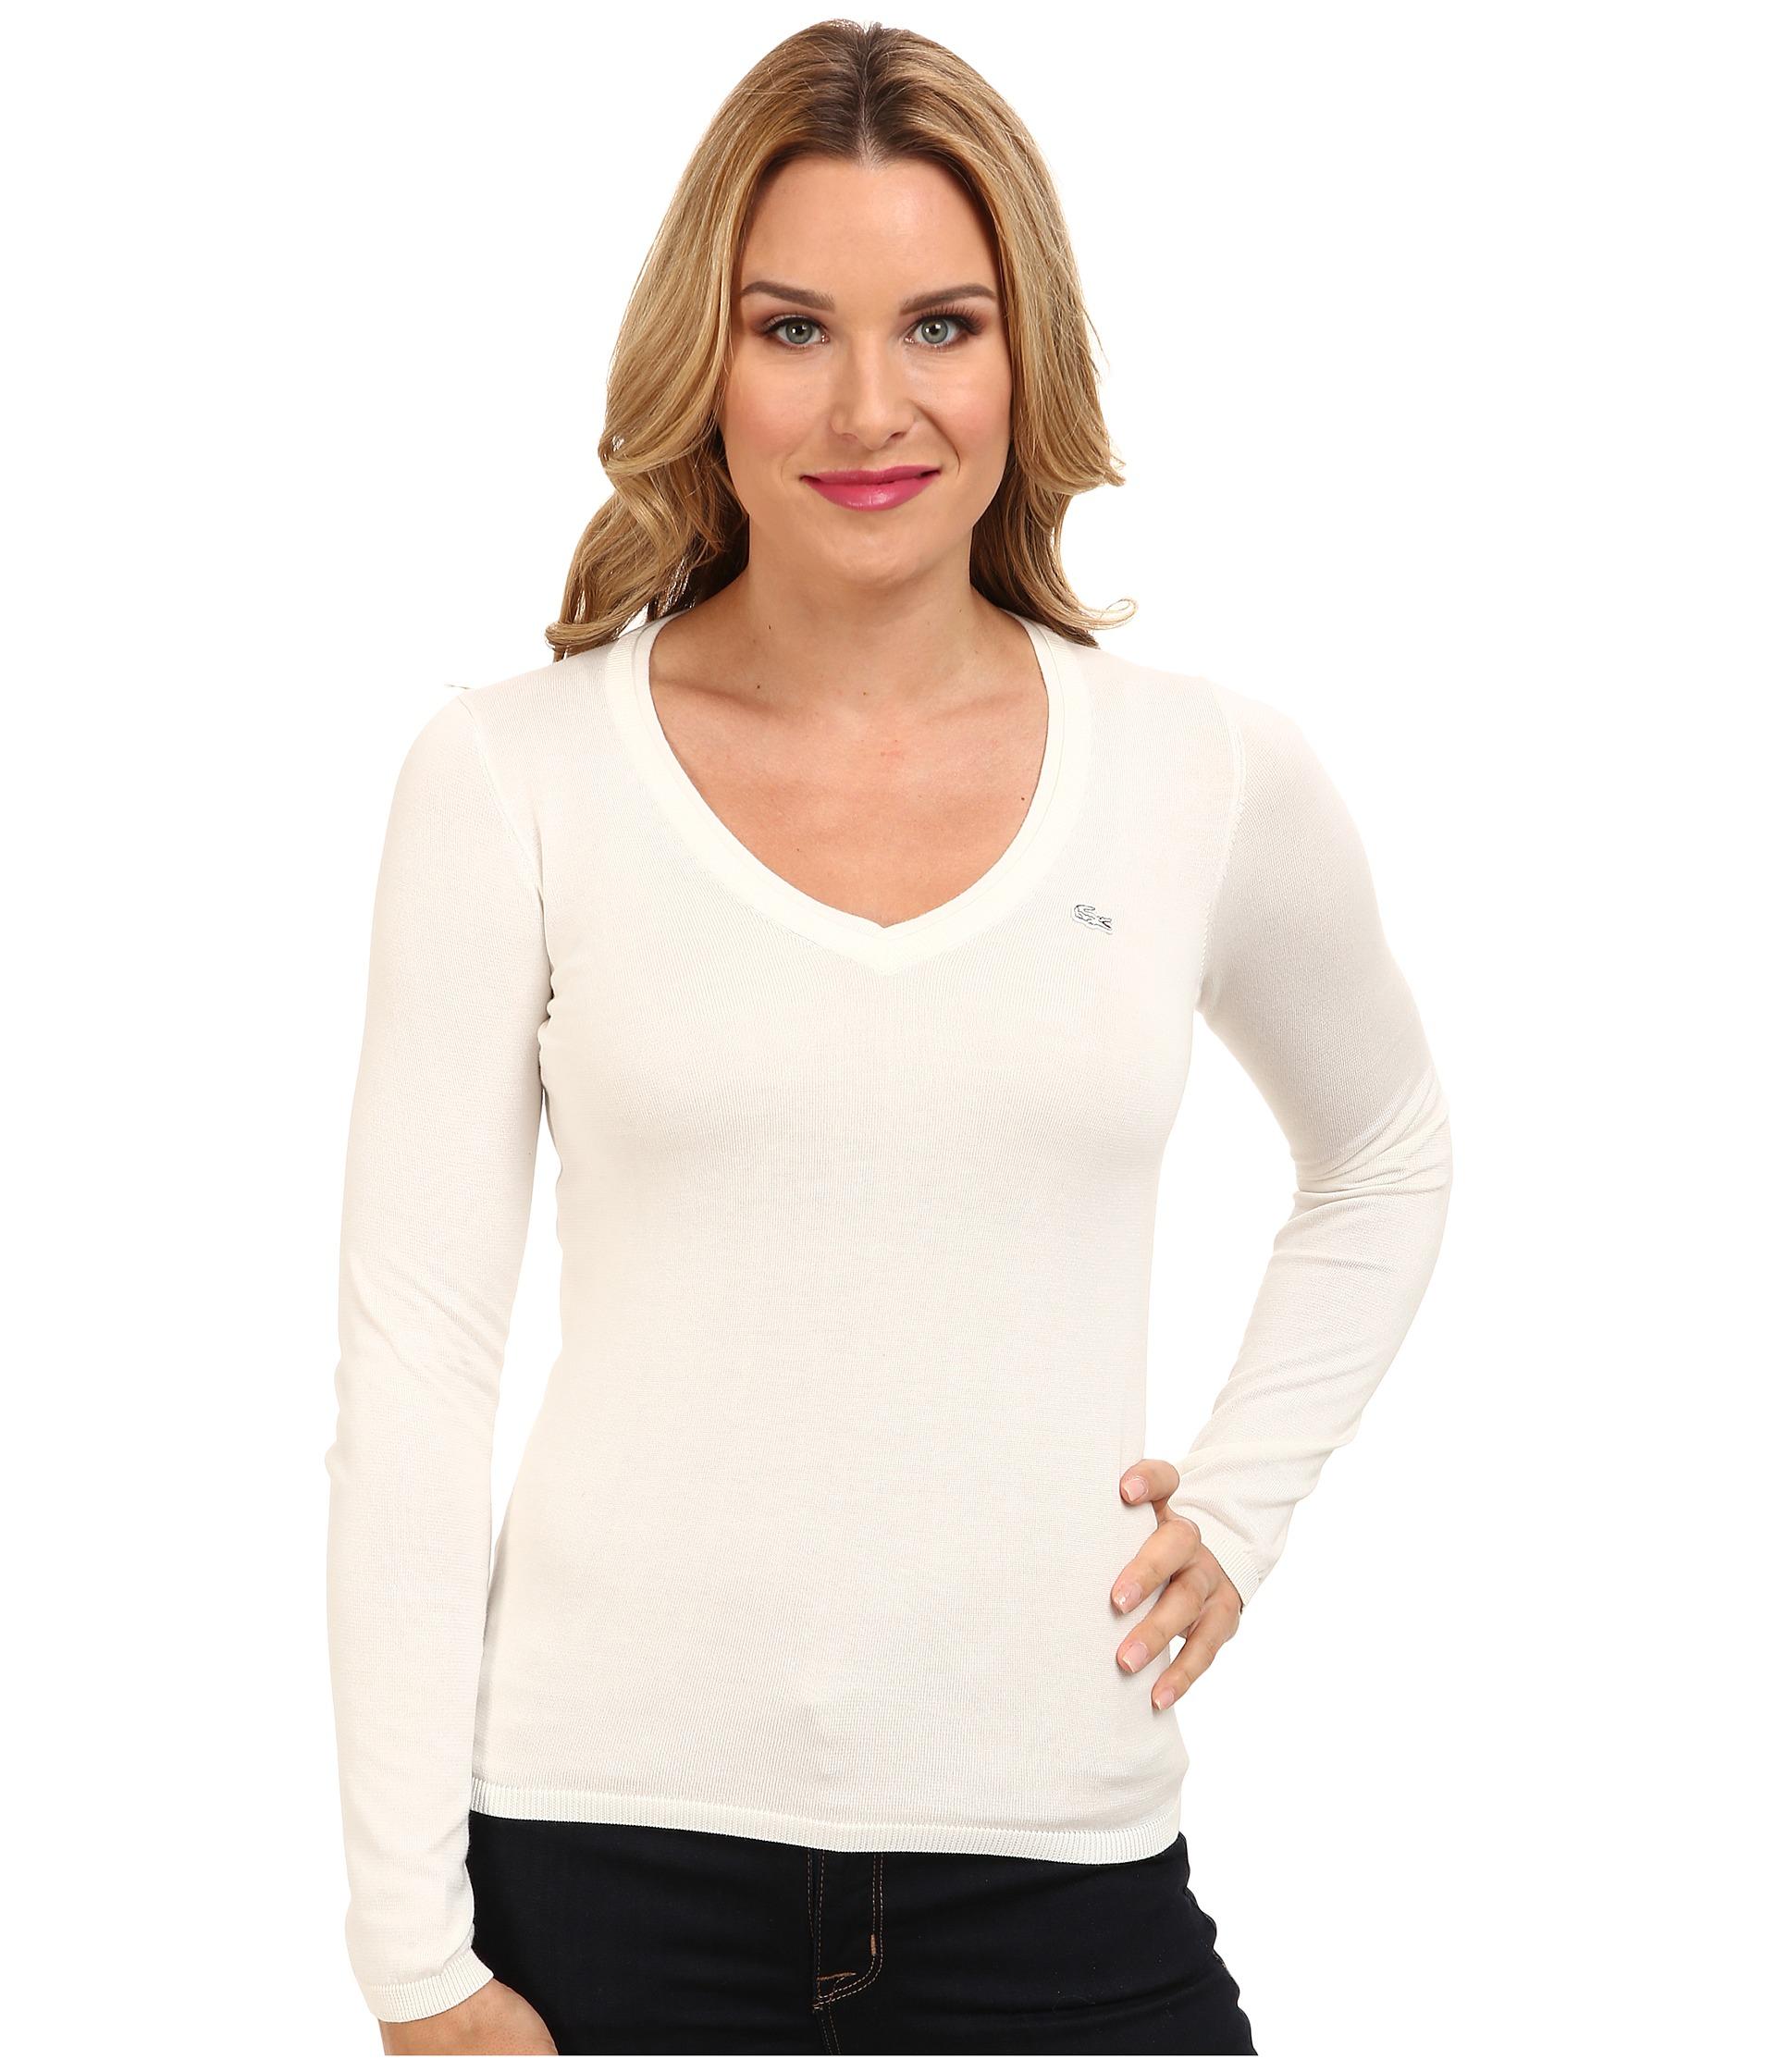 f9afb0ea4b1 Lacoste Women Long Sleeve Cotton Double Overlay V-Neck Sweater Damenmode  Black SALE